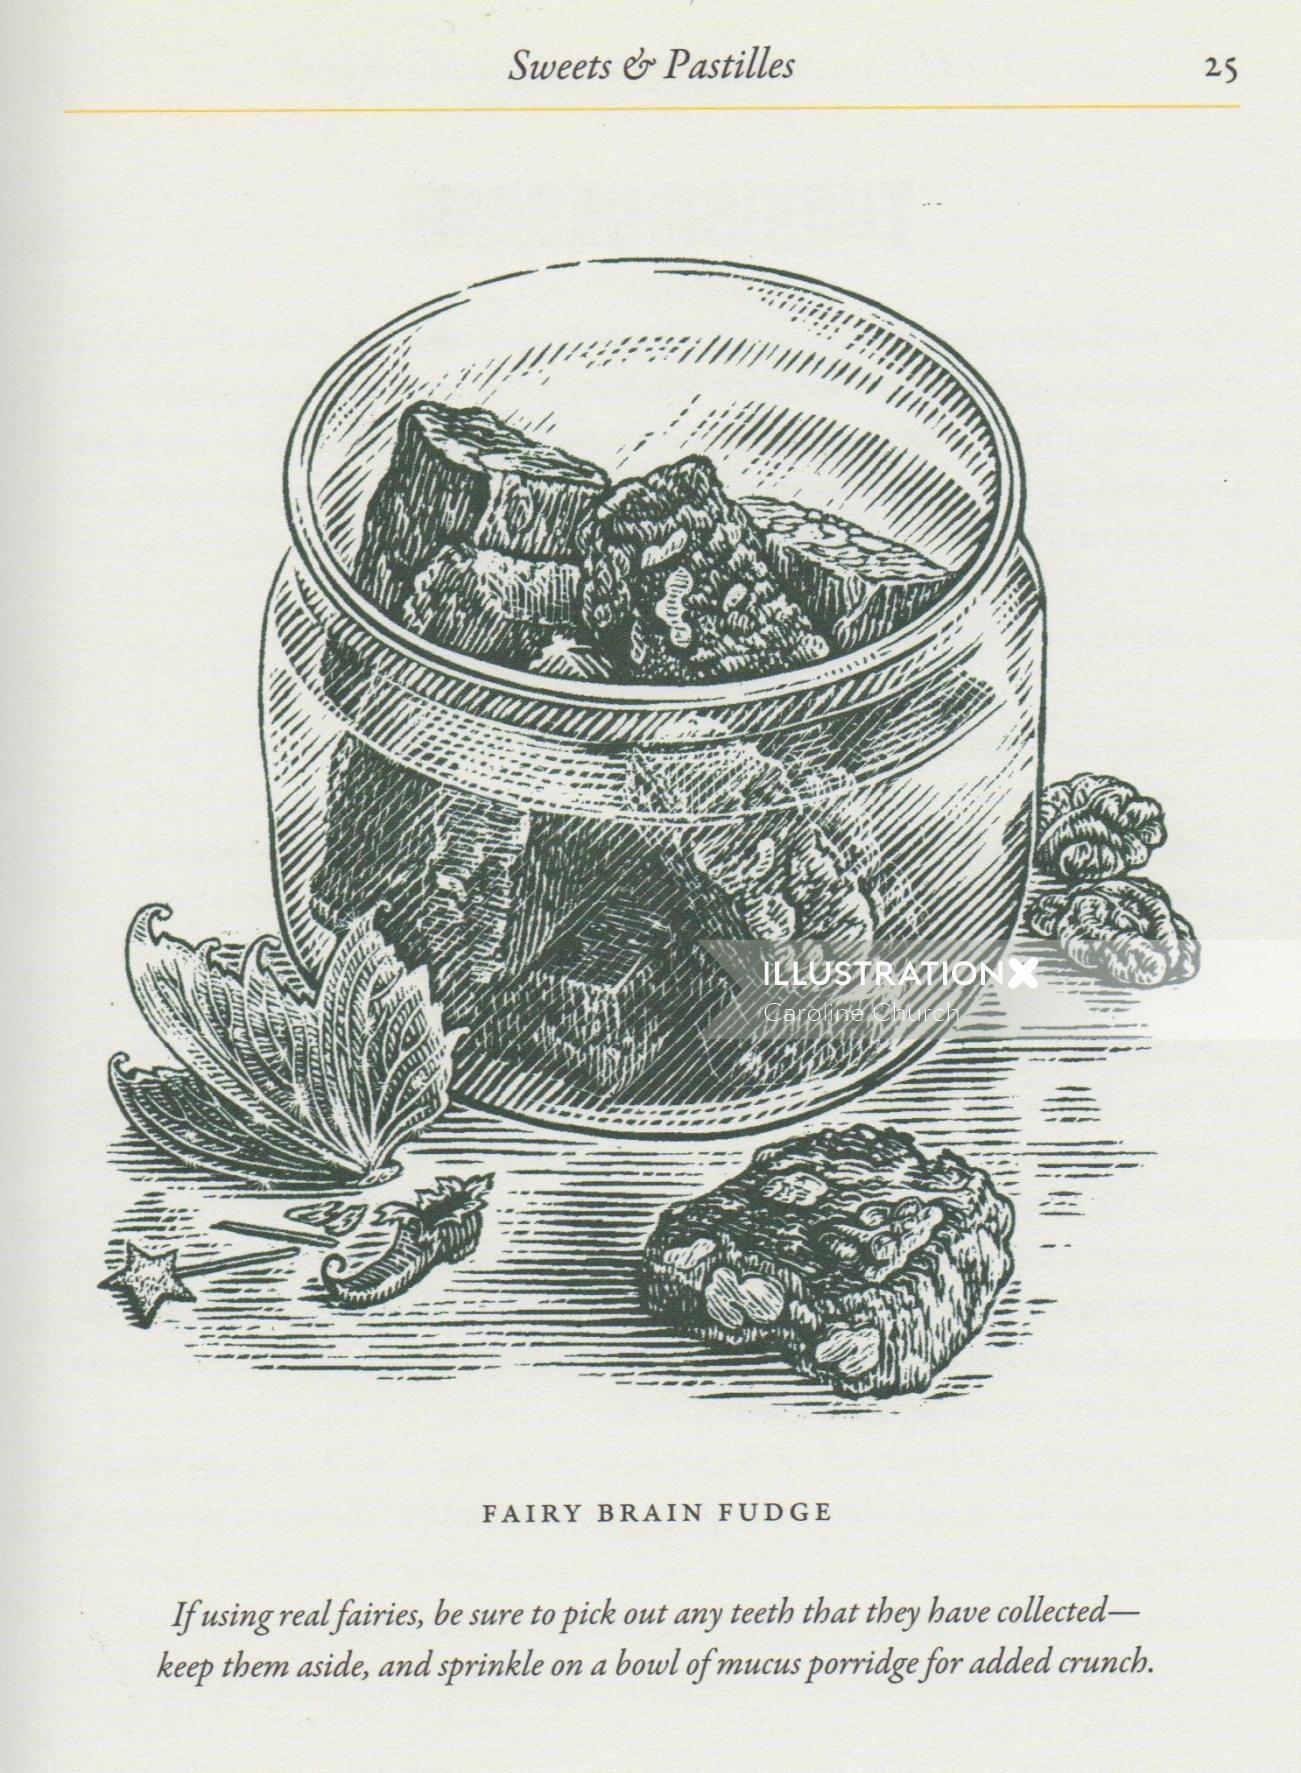 Food & Drink Fairy Brain Fudge